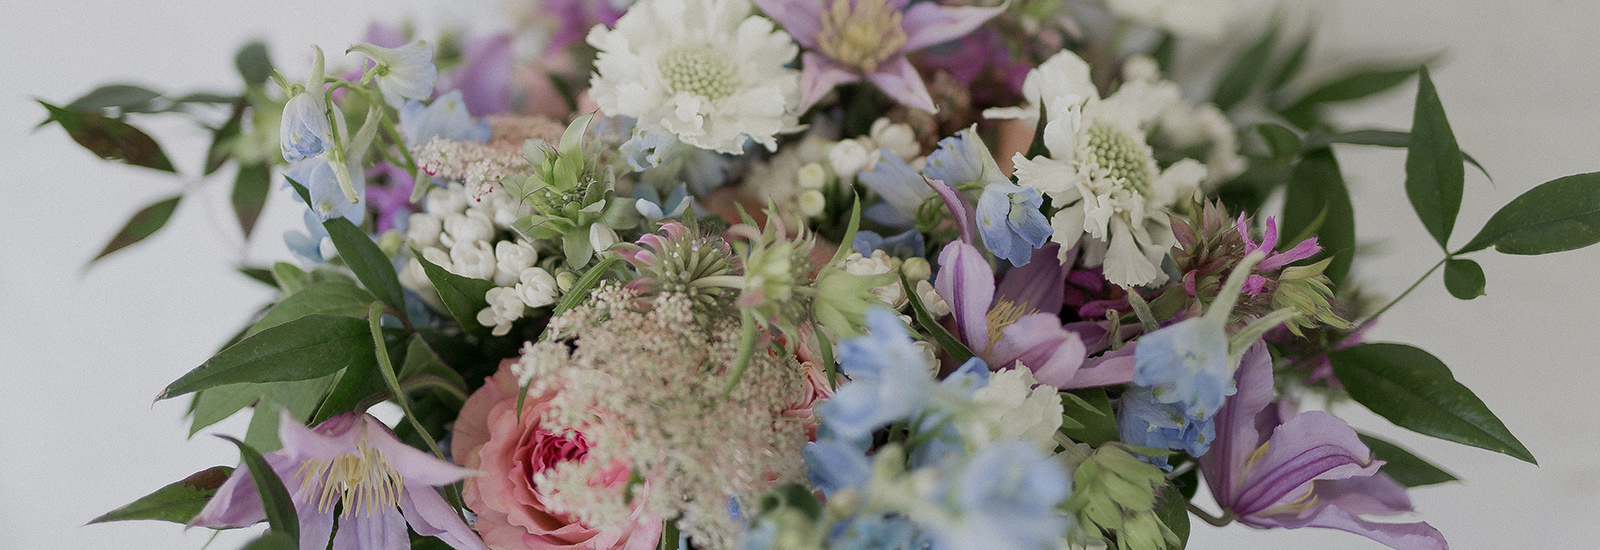 farmington-wedding-flowrs